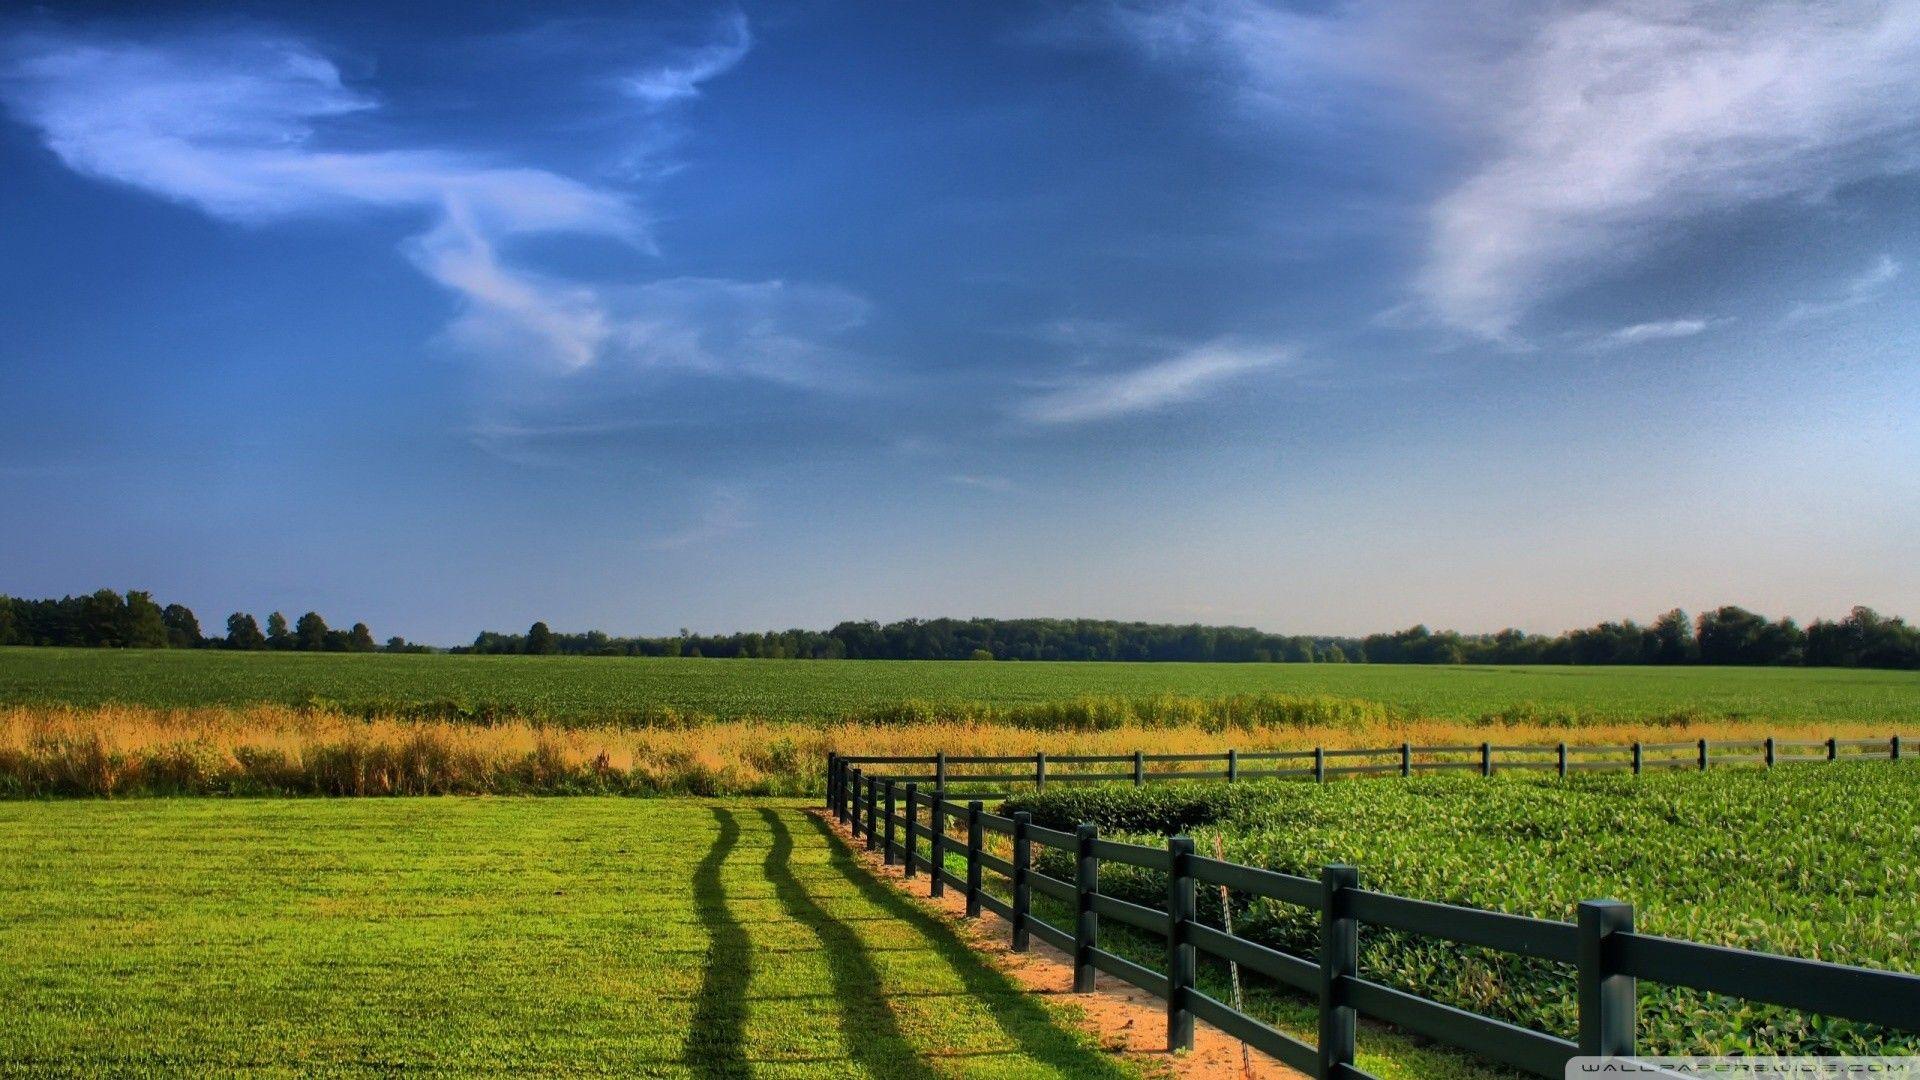 Farming Wallpapers   Top Farming Backgrounds   WallpaperAccess 1920x1080